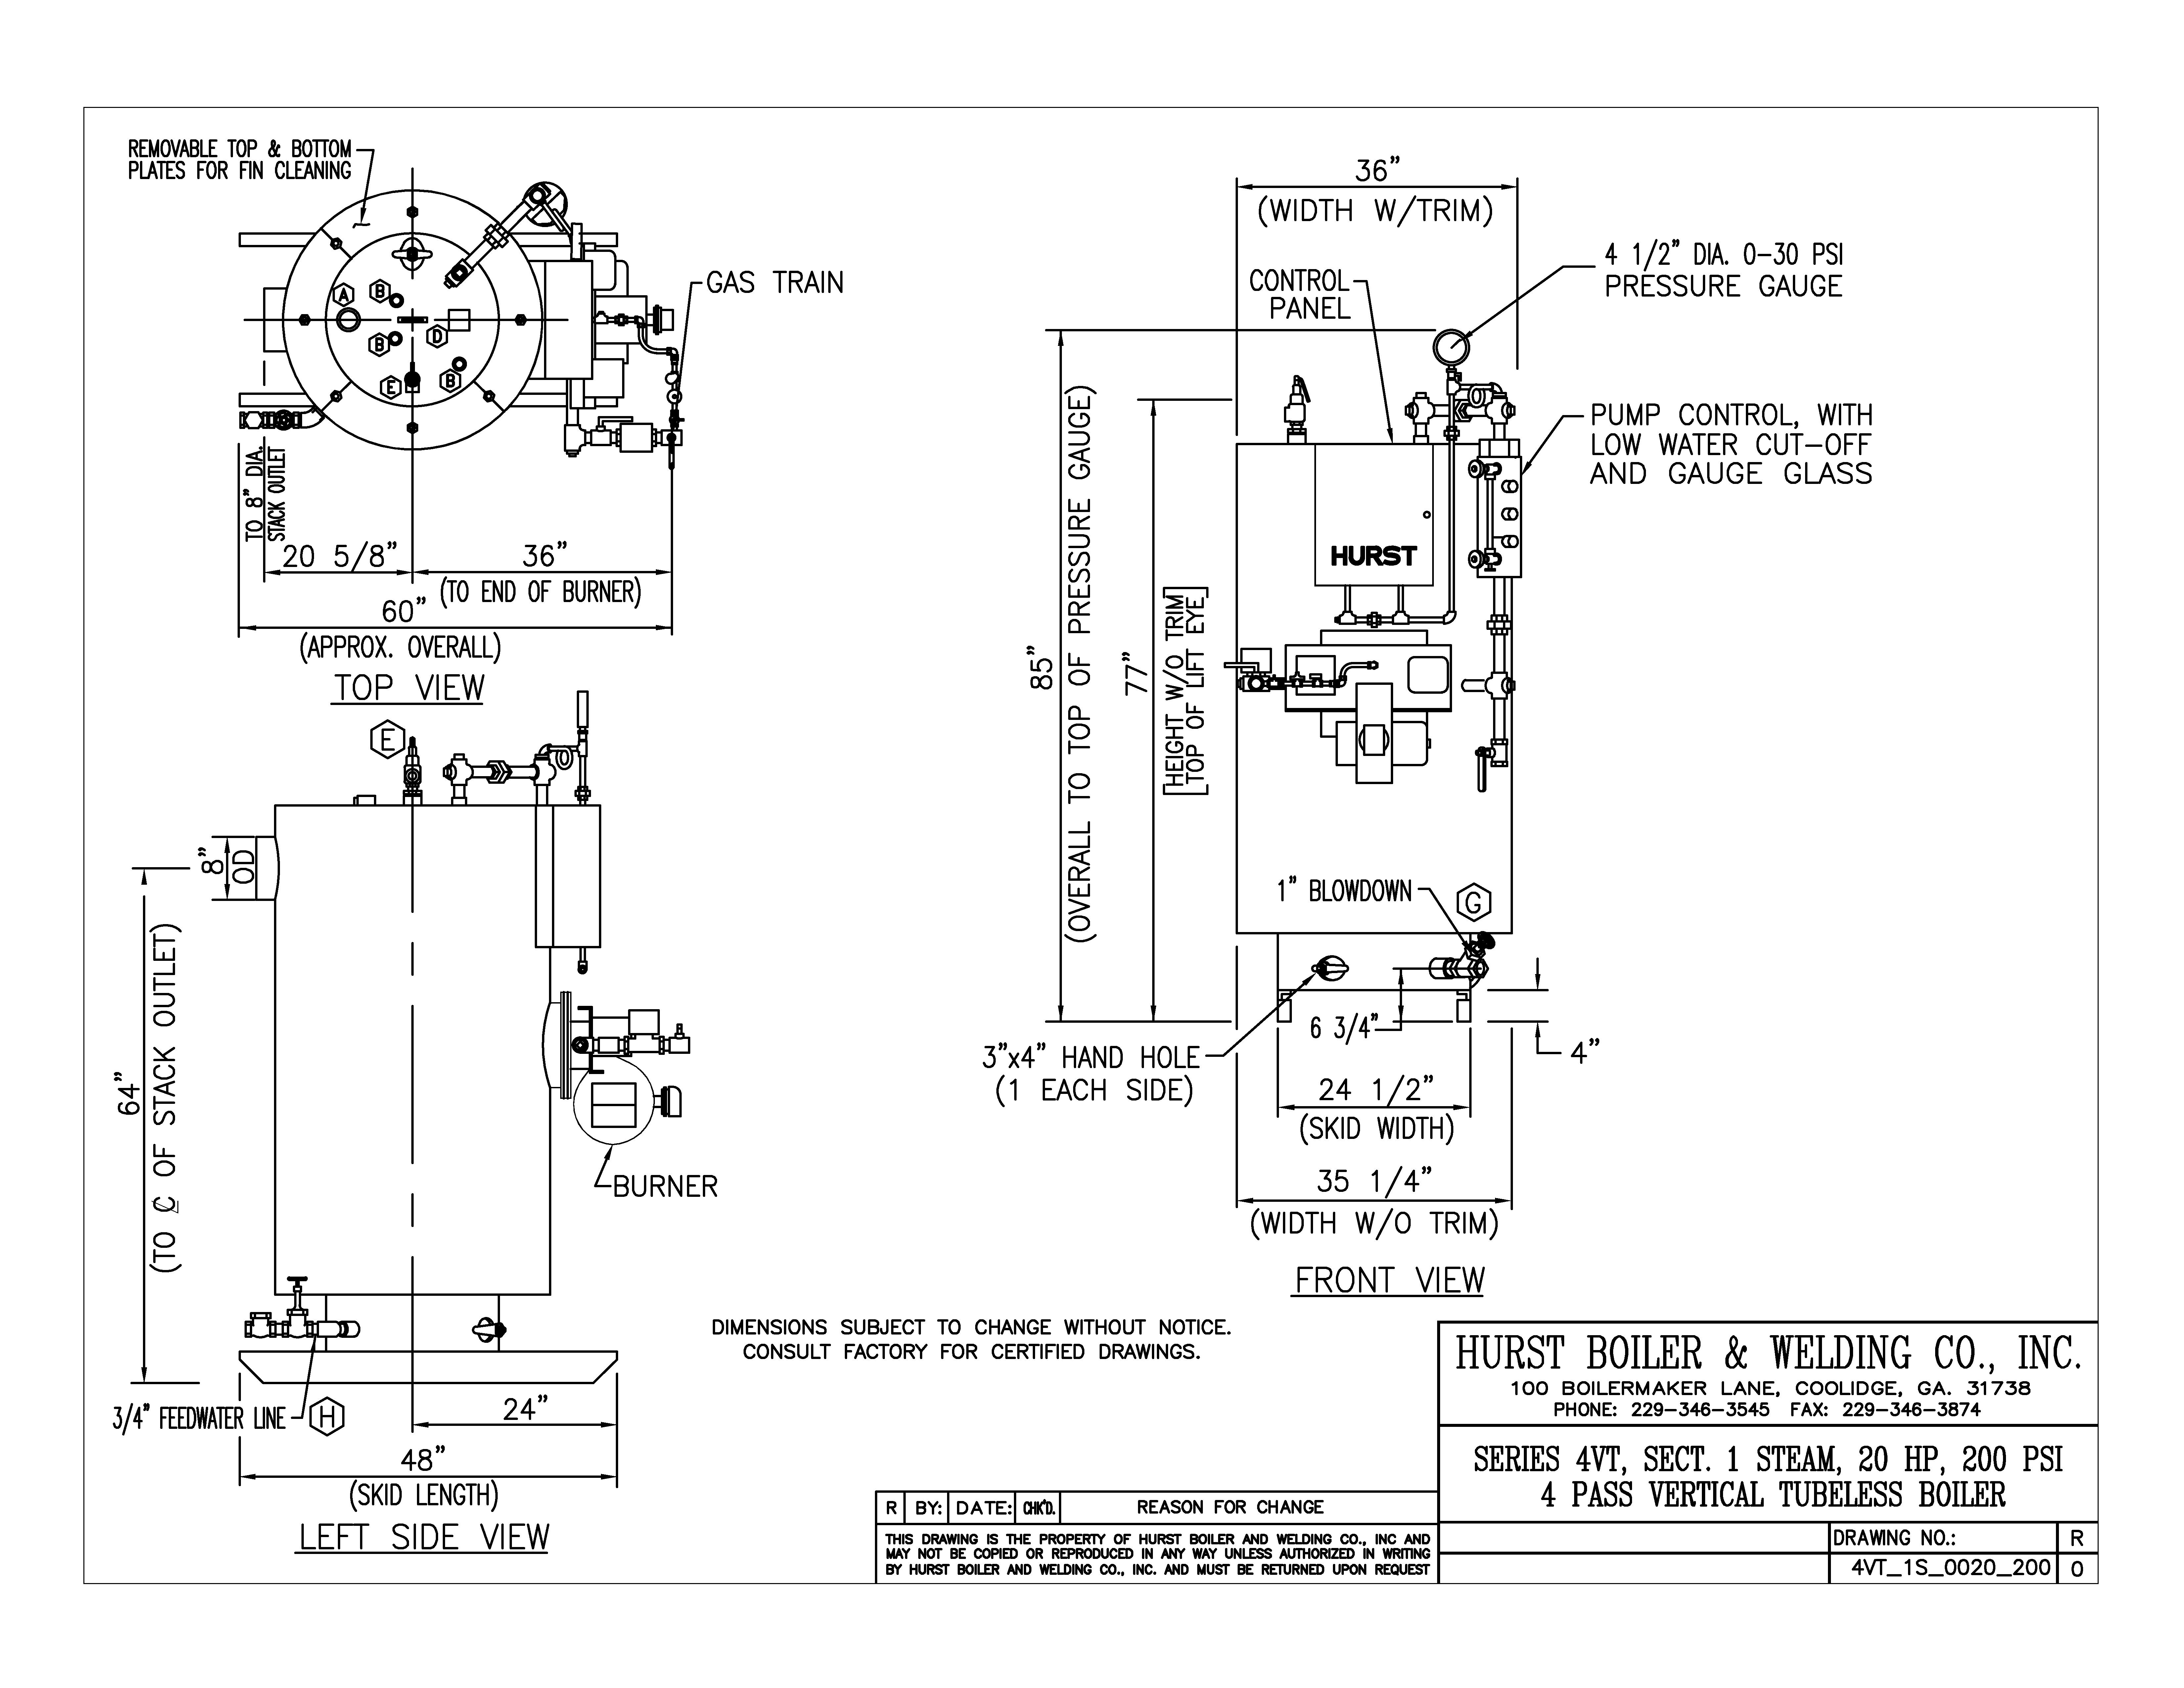 Hurst Boiler Wiring Diagram 27 Images 4vt 1s 0020 200 Catalog Product 0200 37